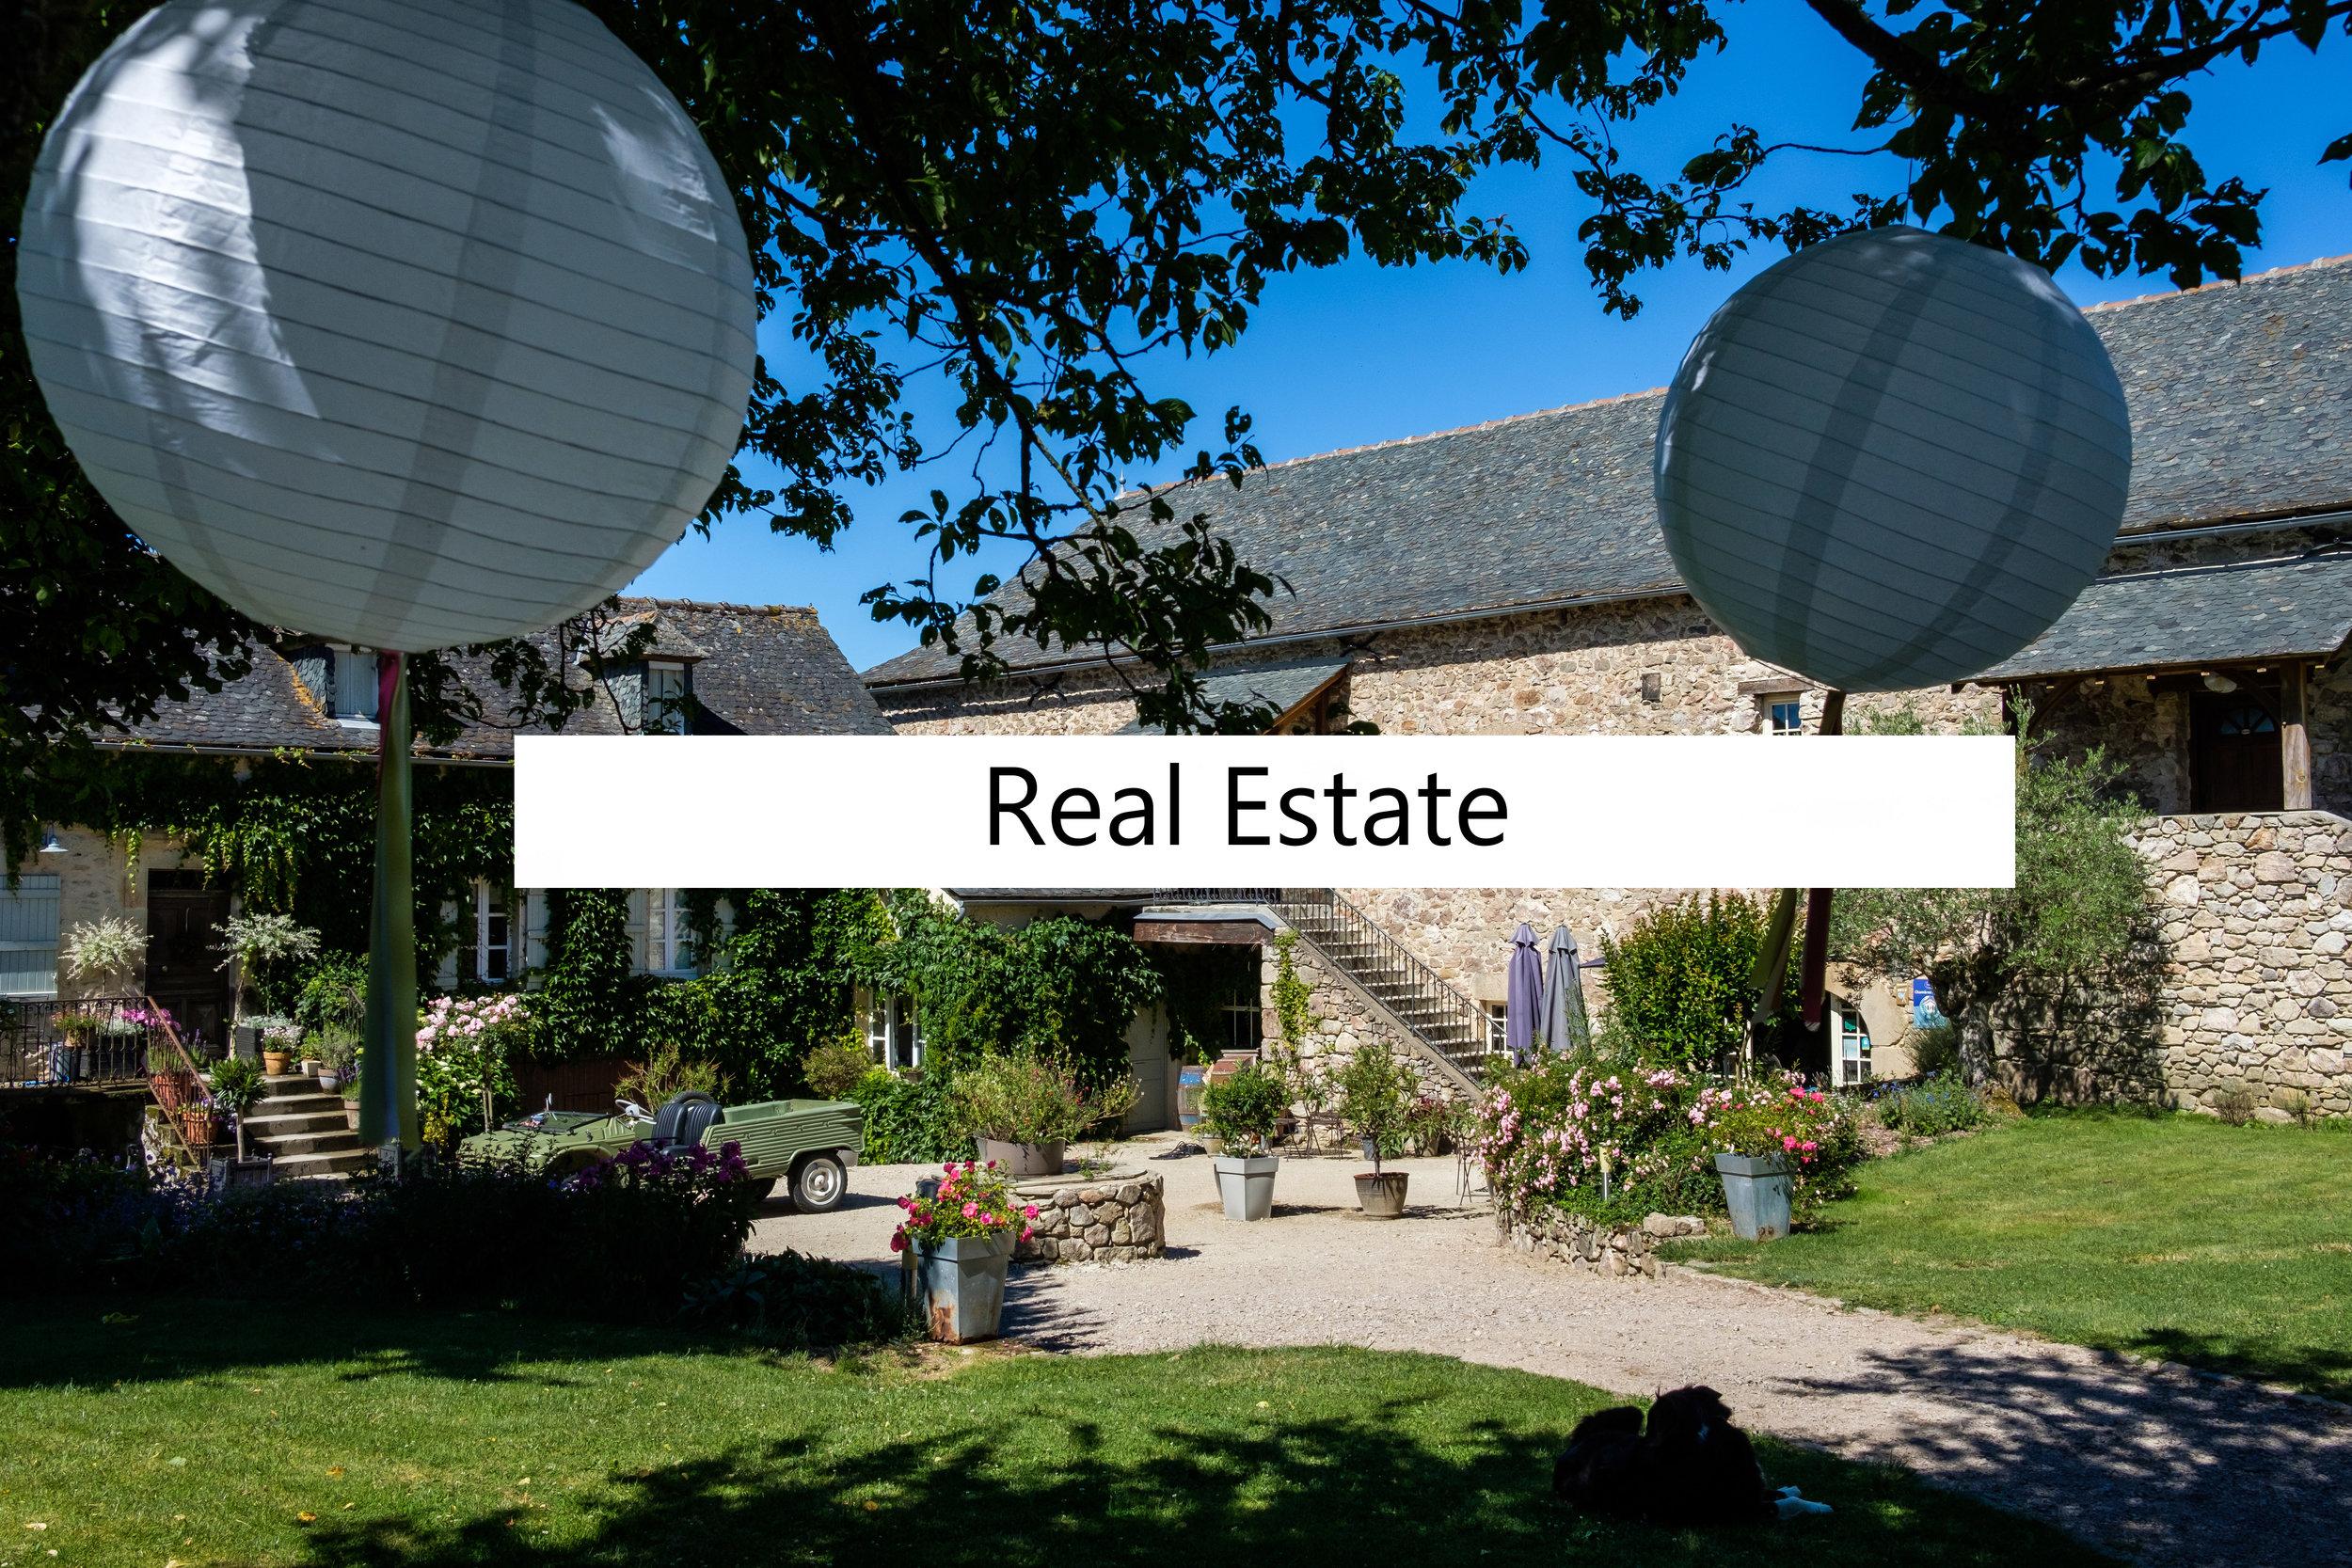 real estate.jpg